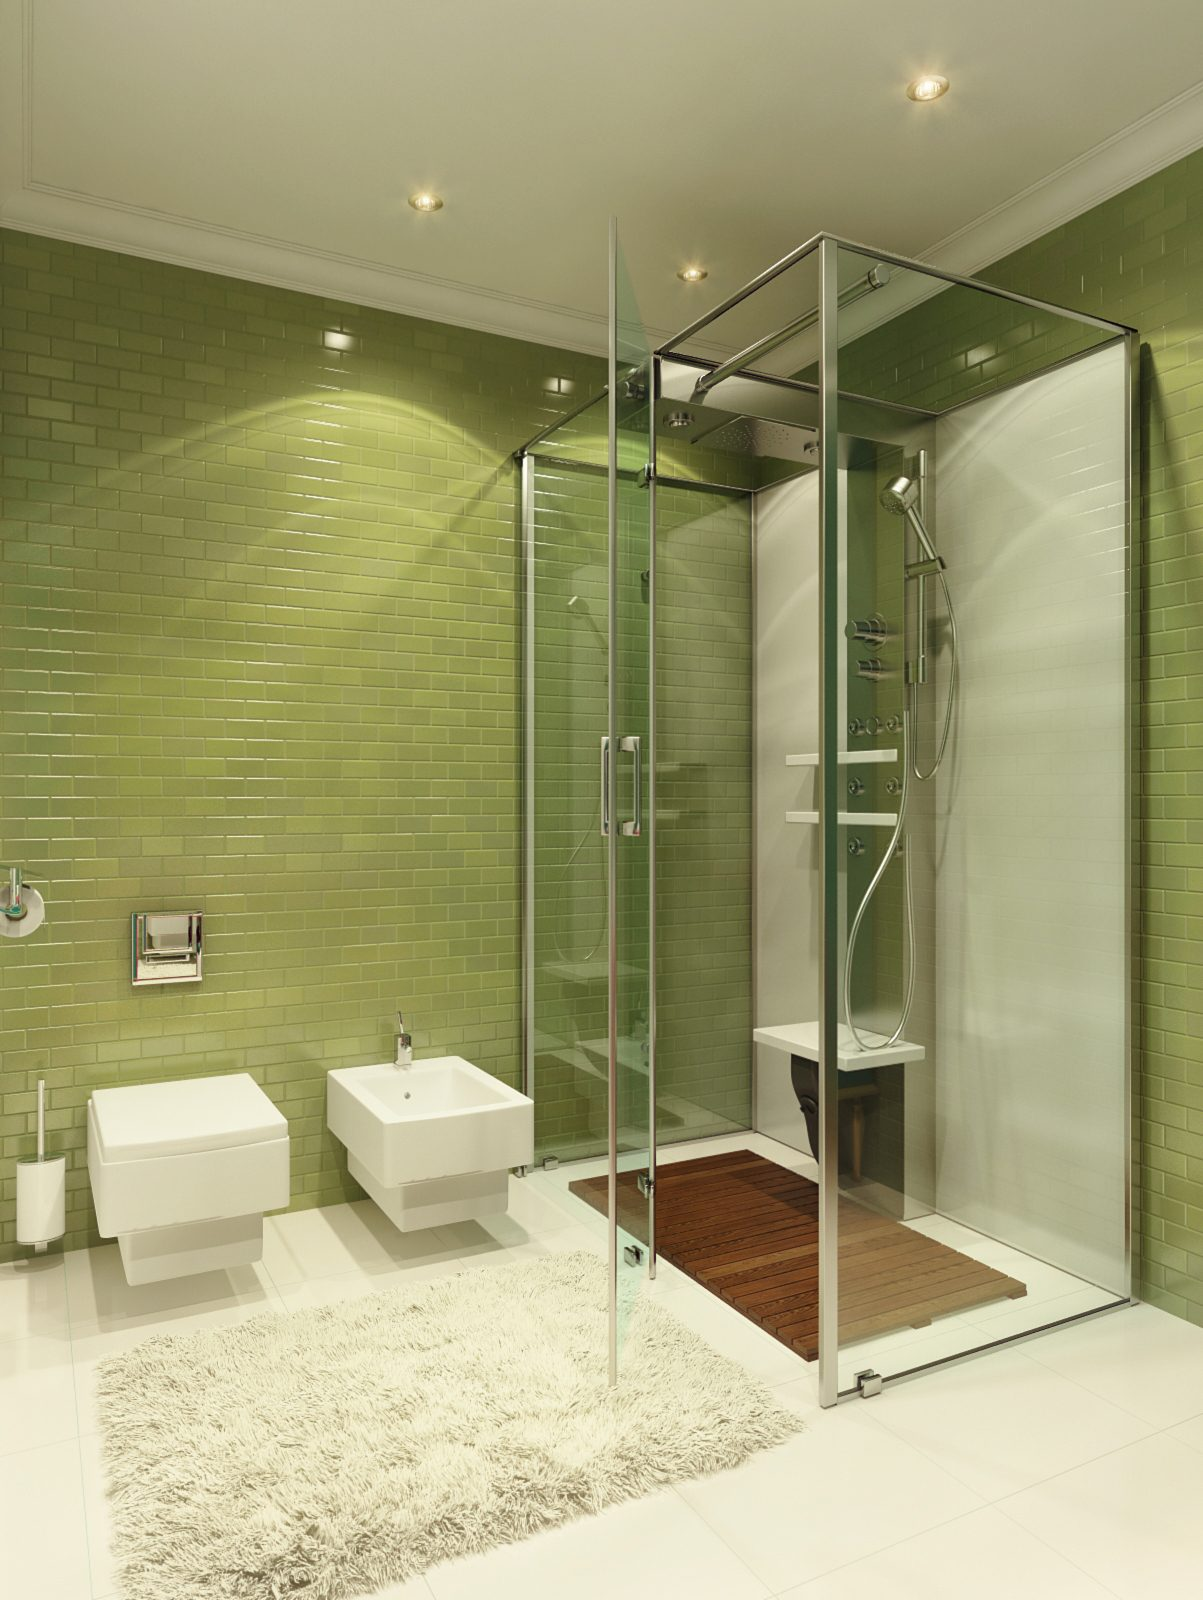 1. 27 cool granite bathroom floor tiles ideas and pictures